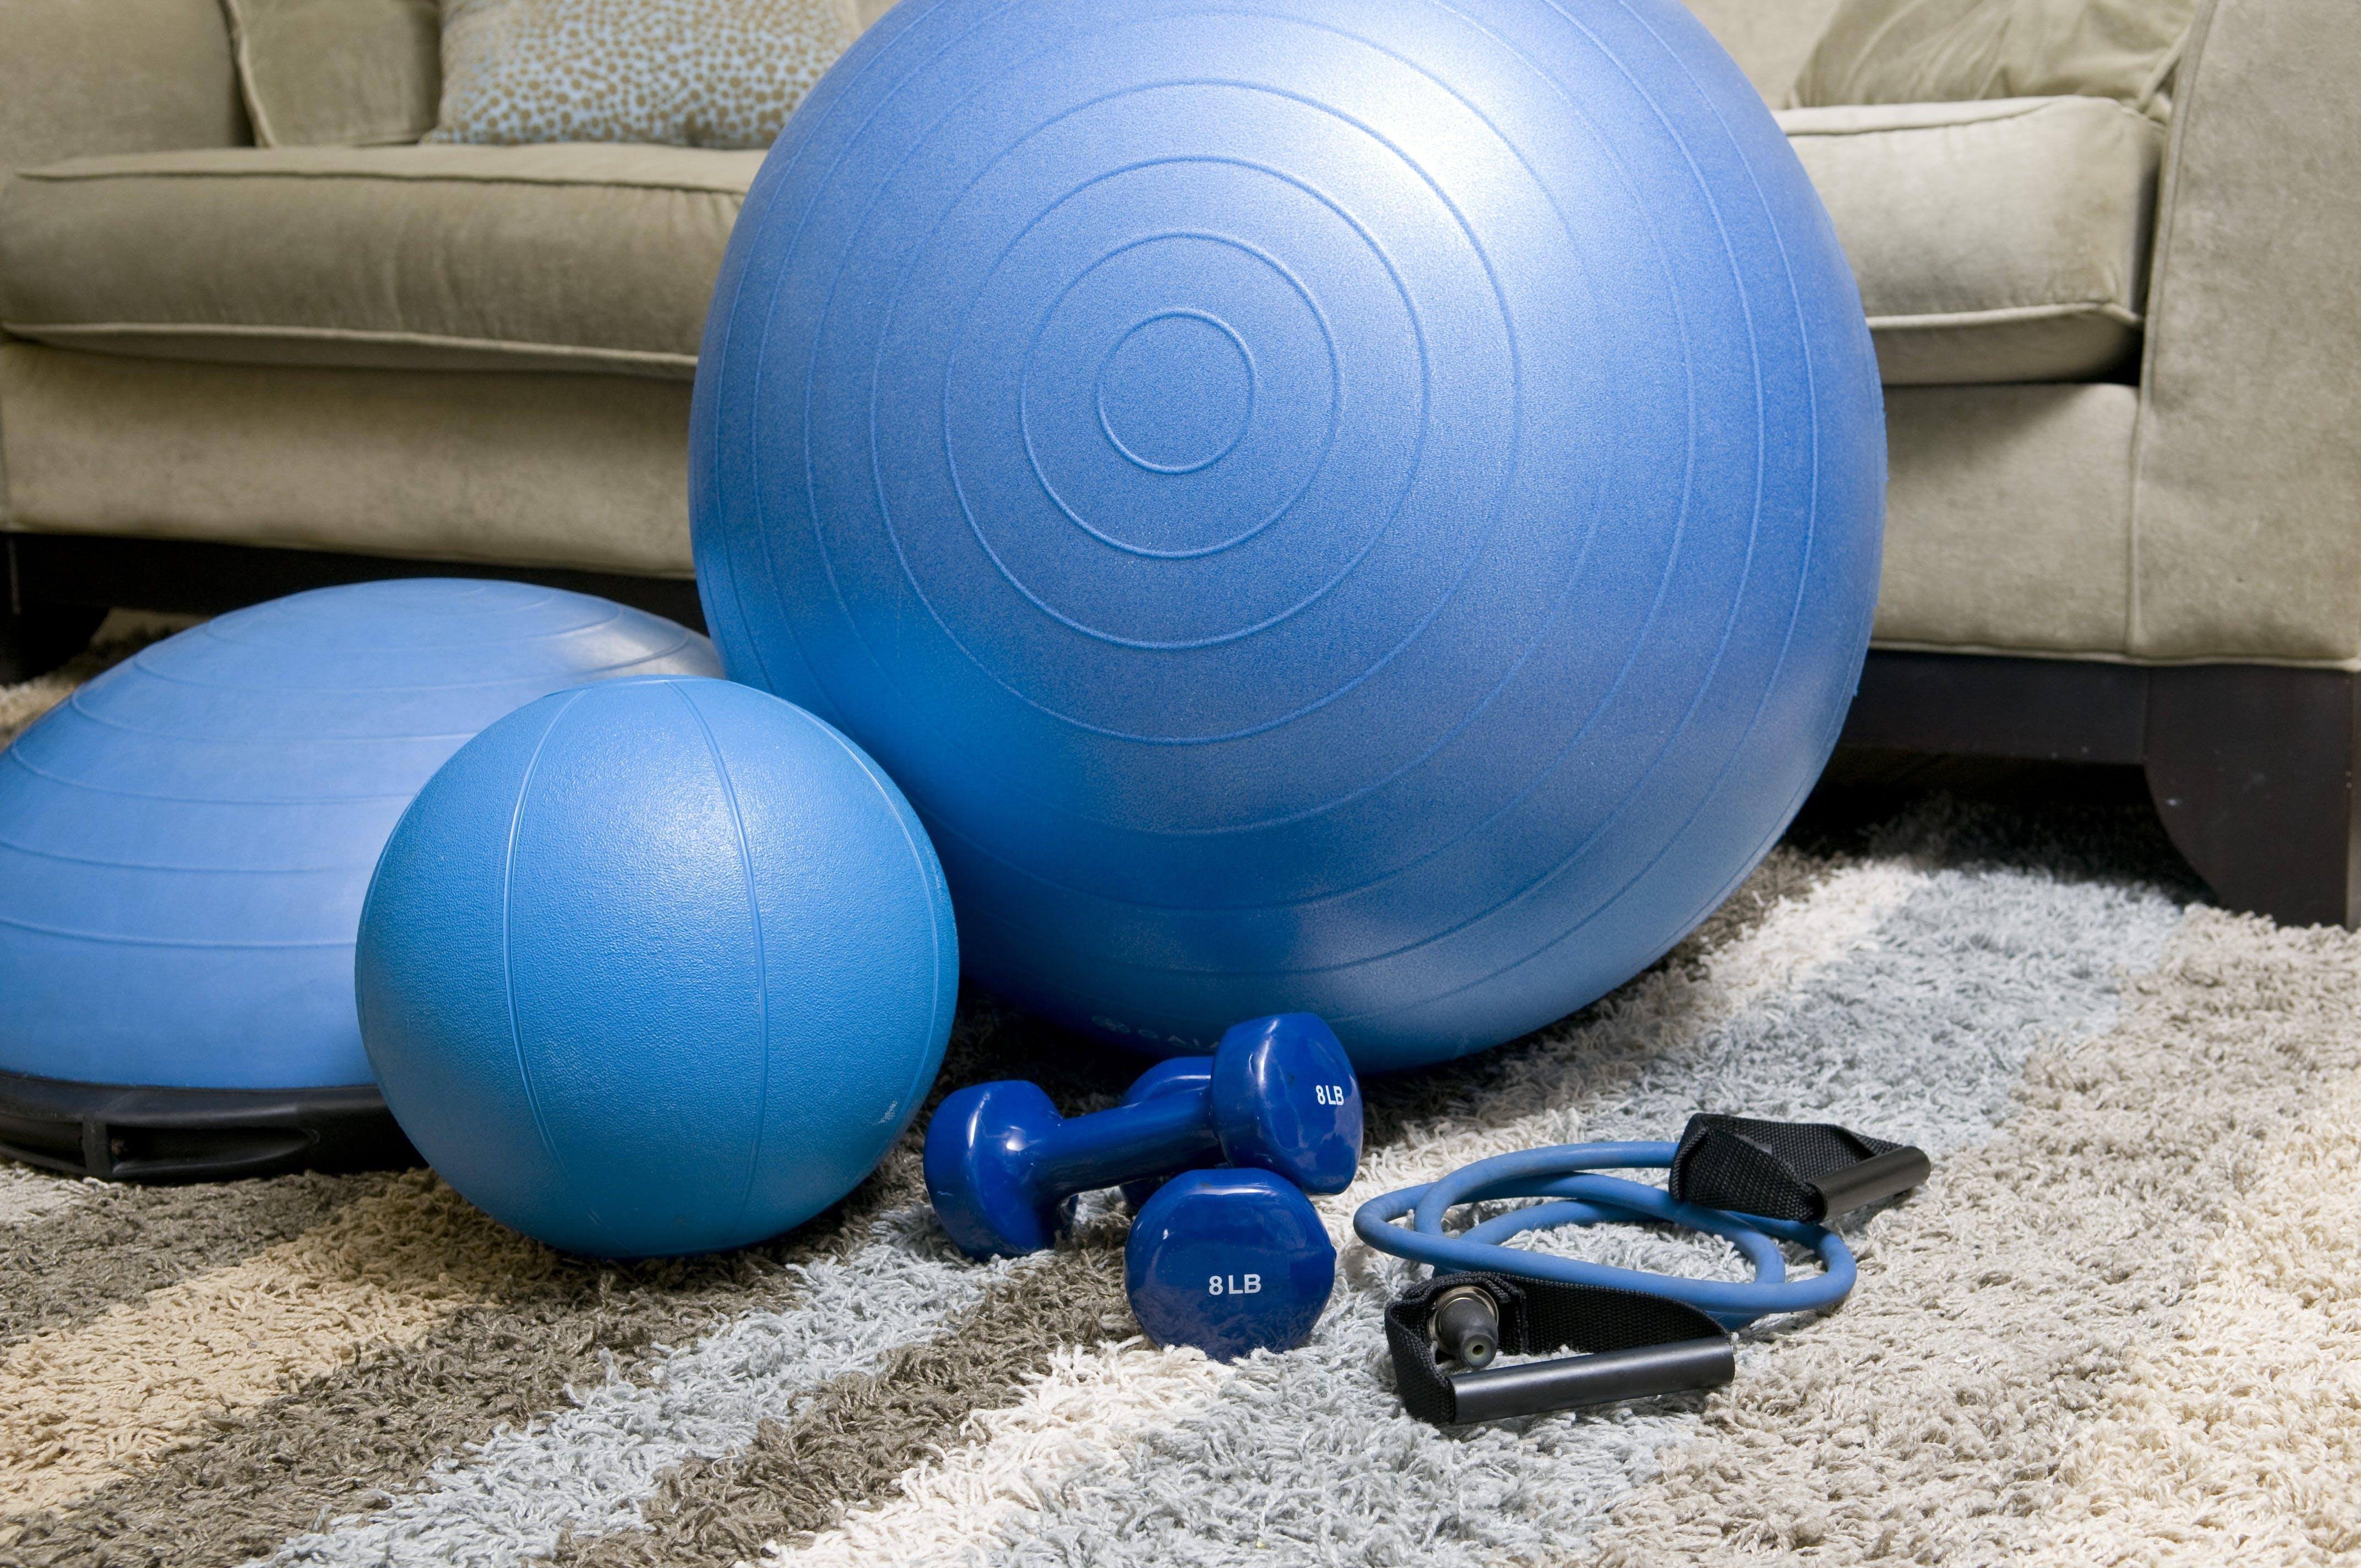 blue fitness equipment, equipment, fitness